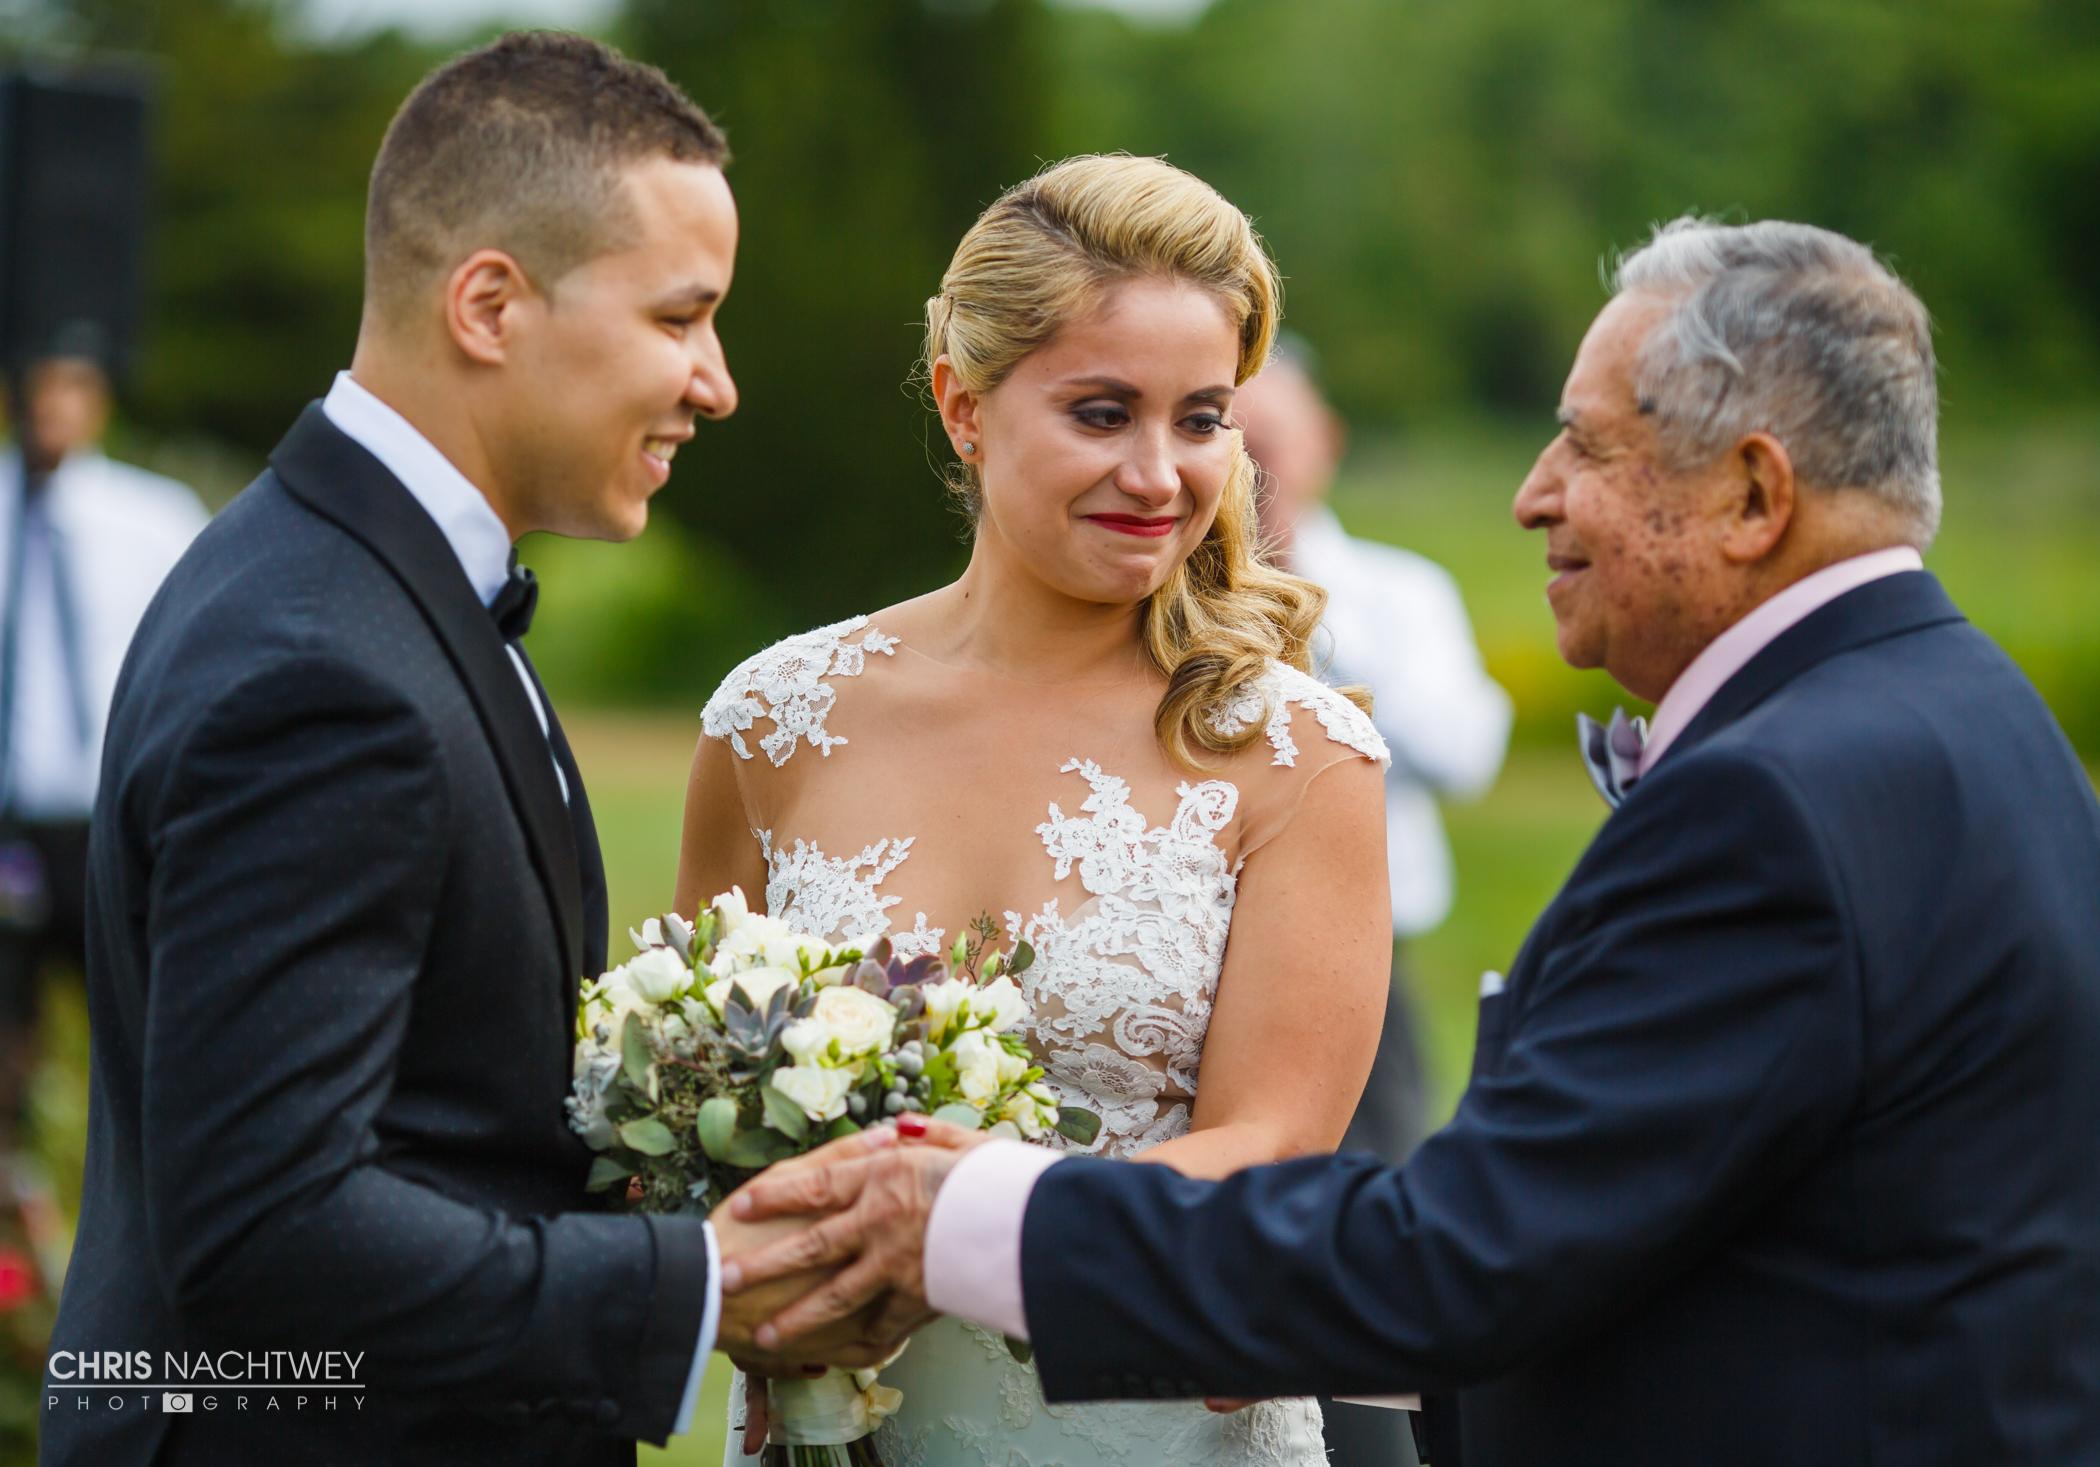 wedding-saltwater-farm-vineyard-photos-stonington-ct-chris-nachtwey-photography-2016-ana-austin-20.jpg